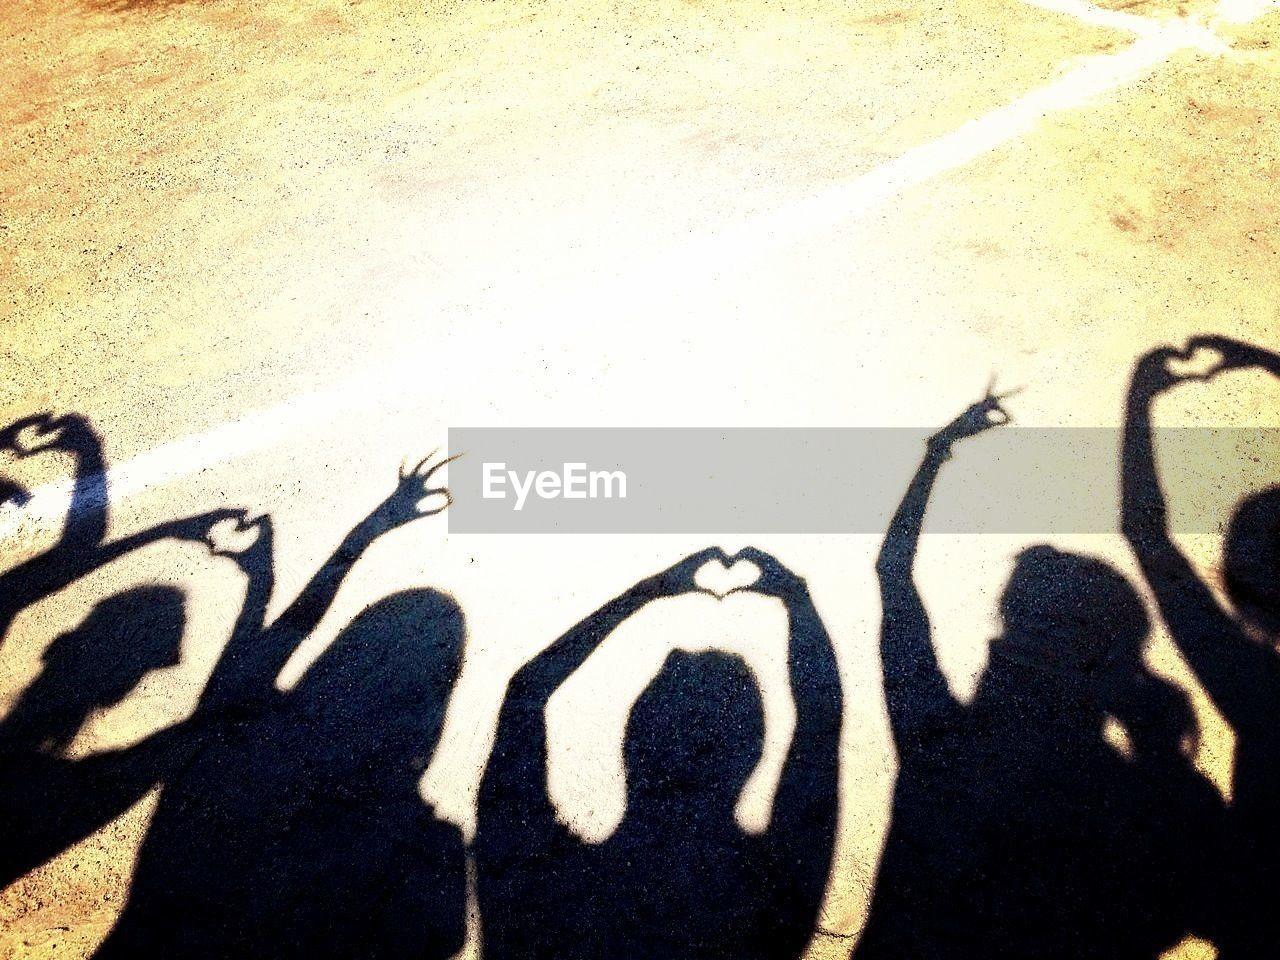 Shadows of people gesturing on ground